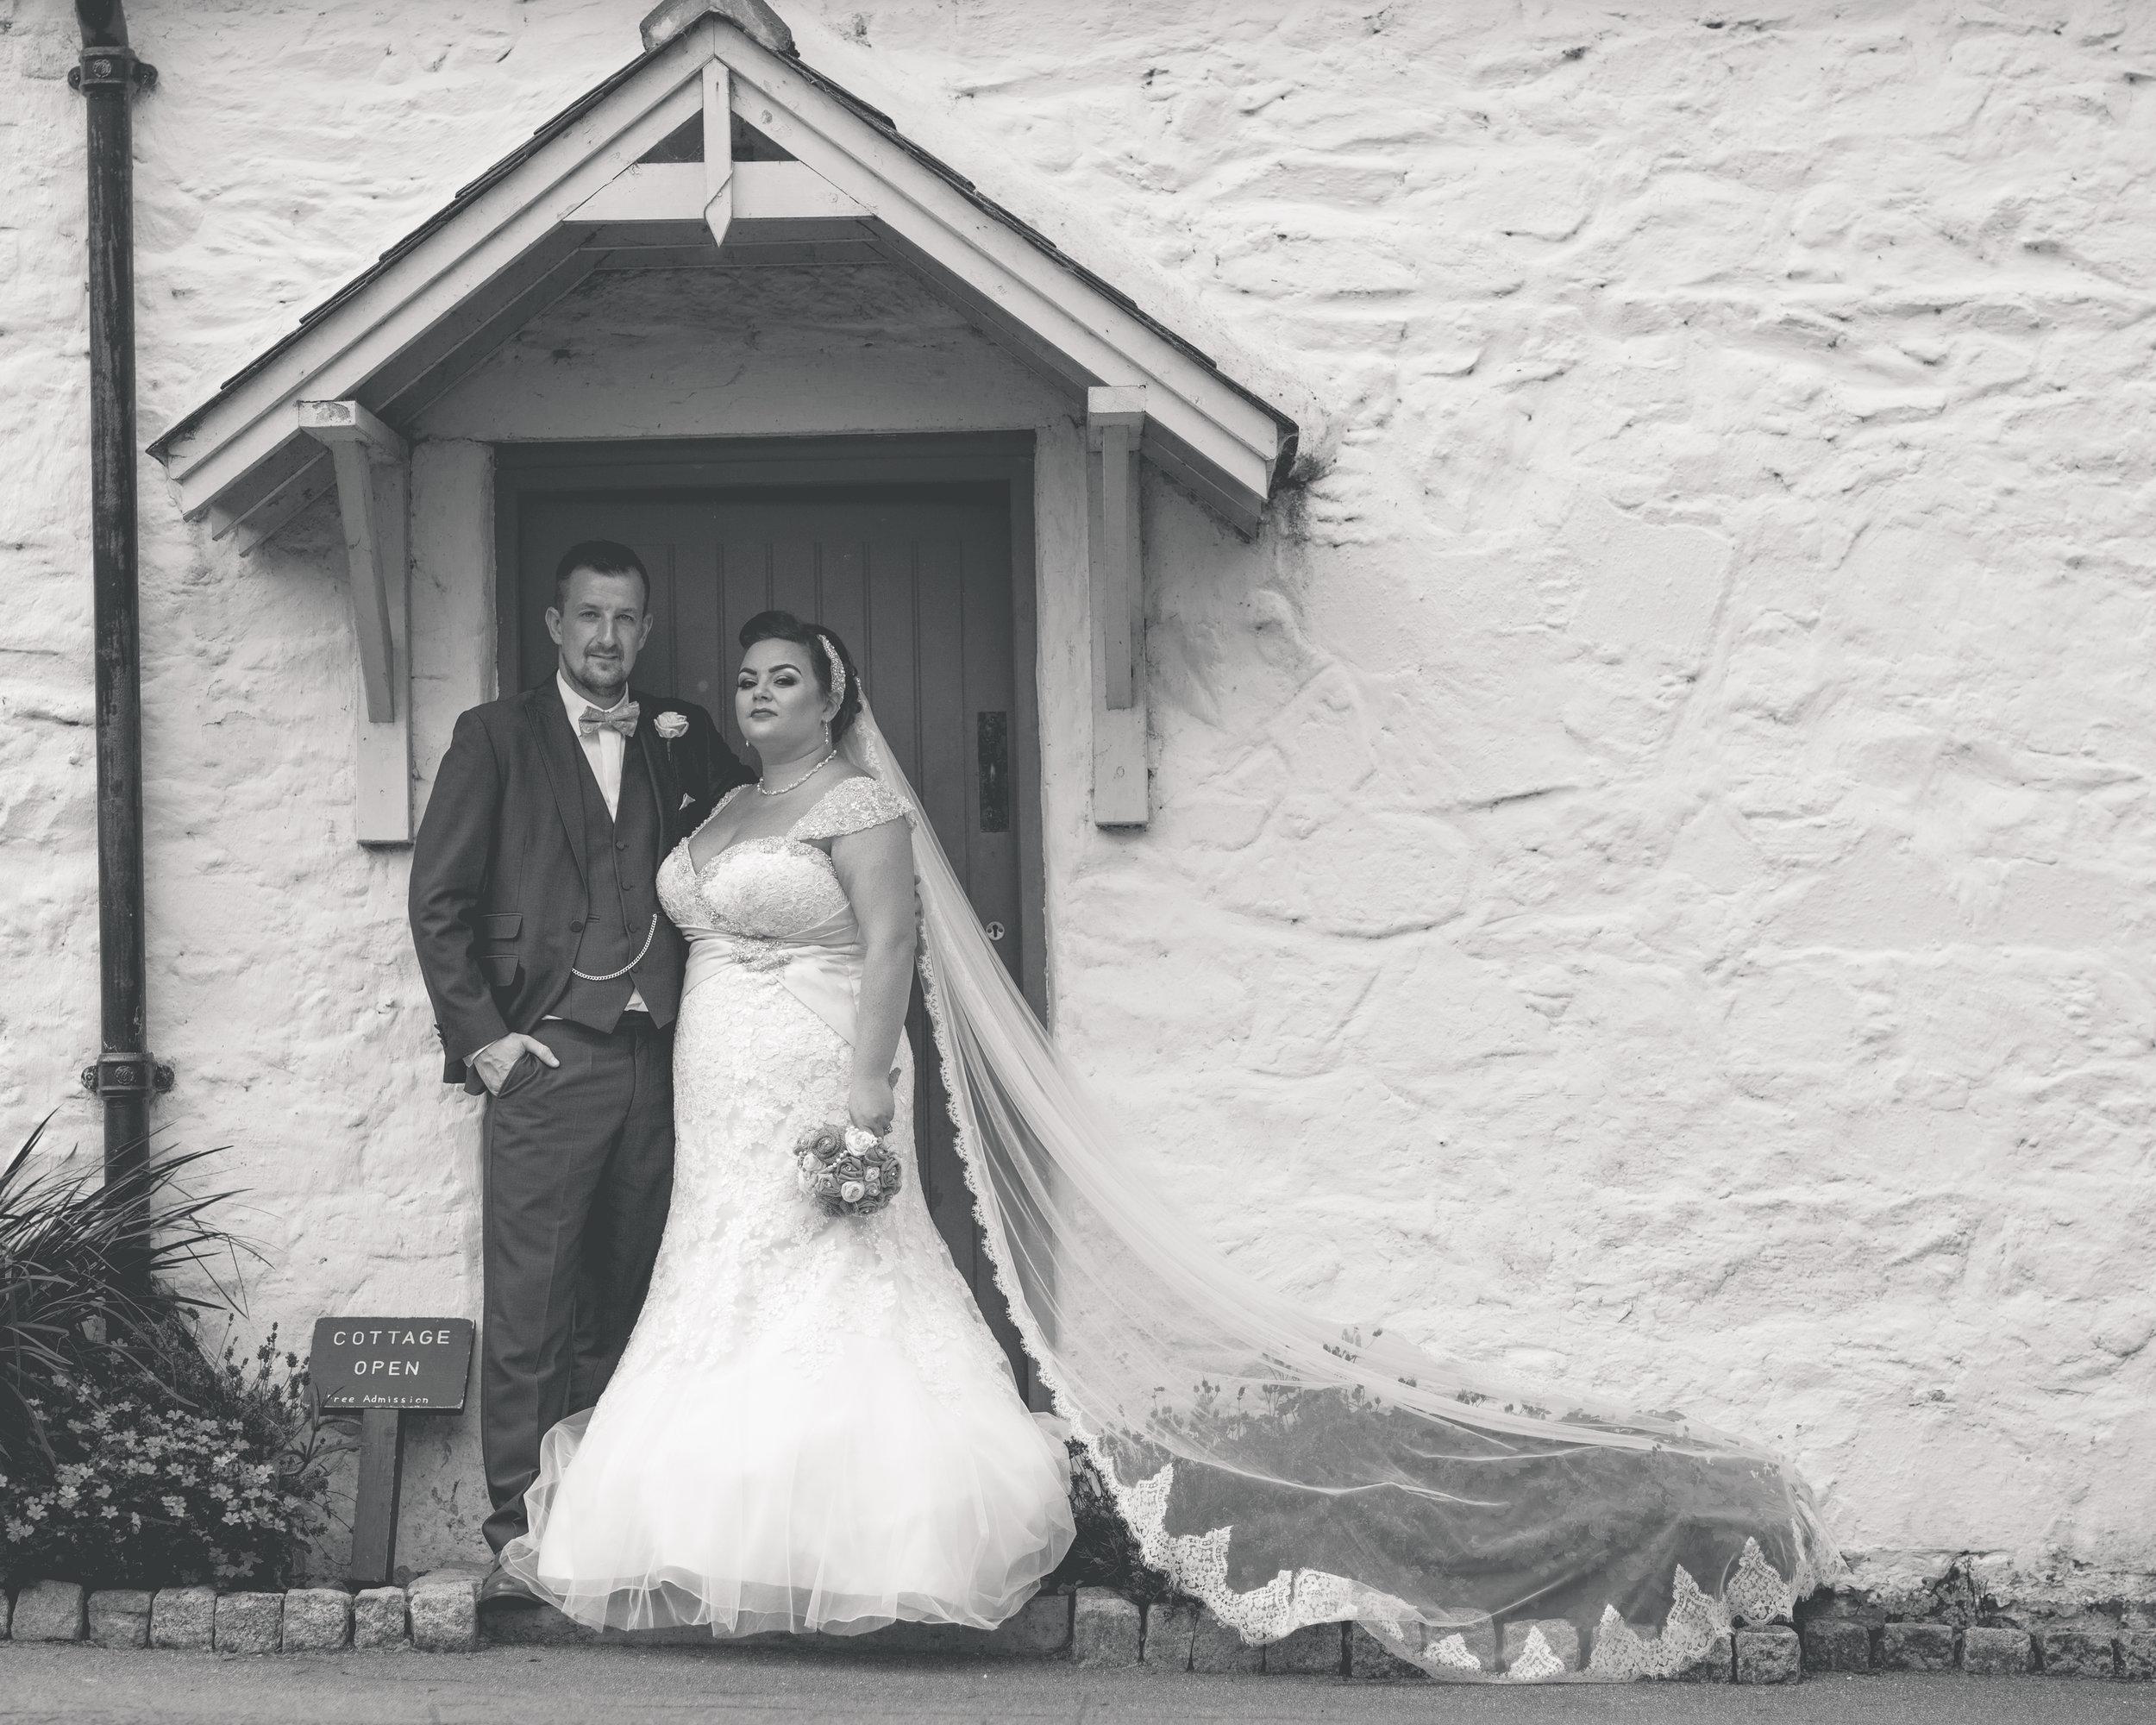 Antoinette & Stephen - Portraits   Brian McEwan Photography   Wedding Photographer Northern Ireland 2.jpg